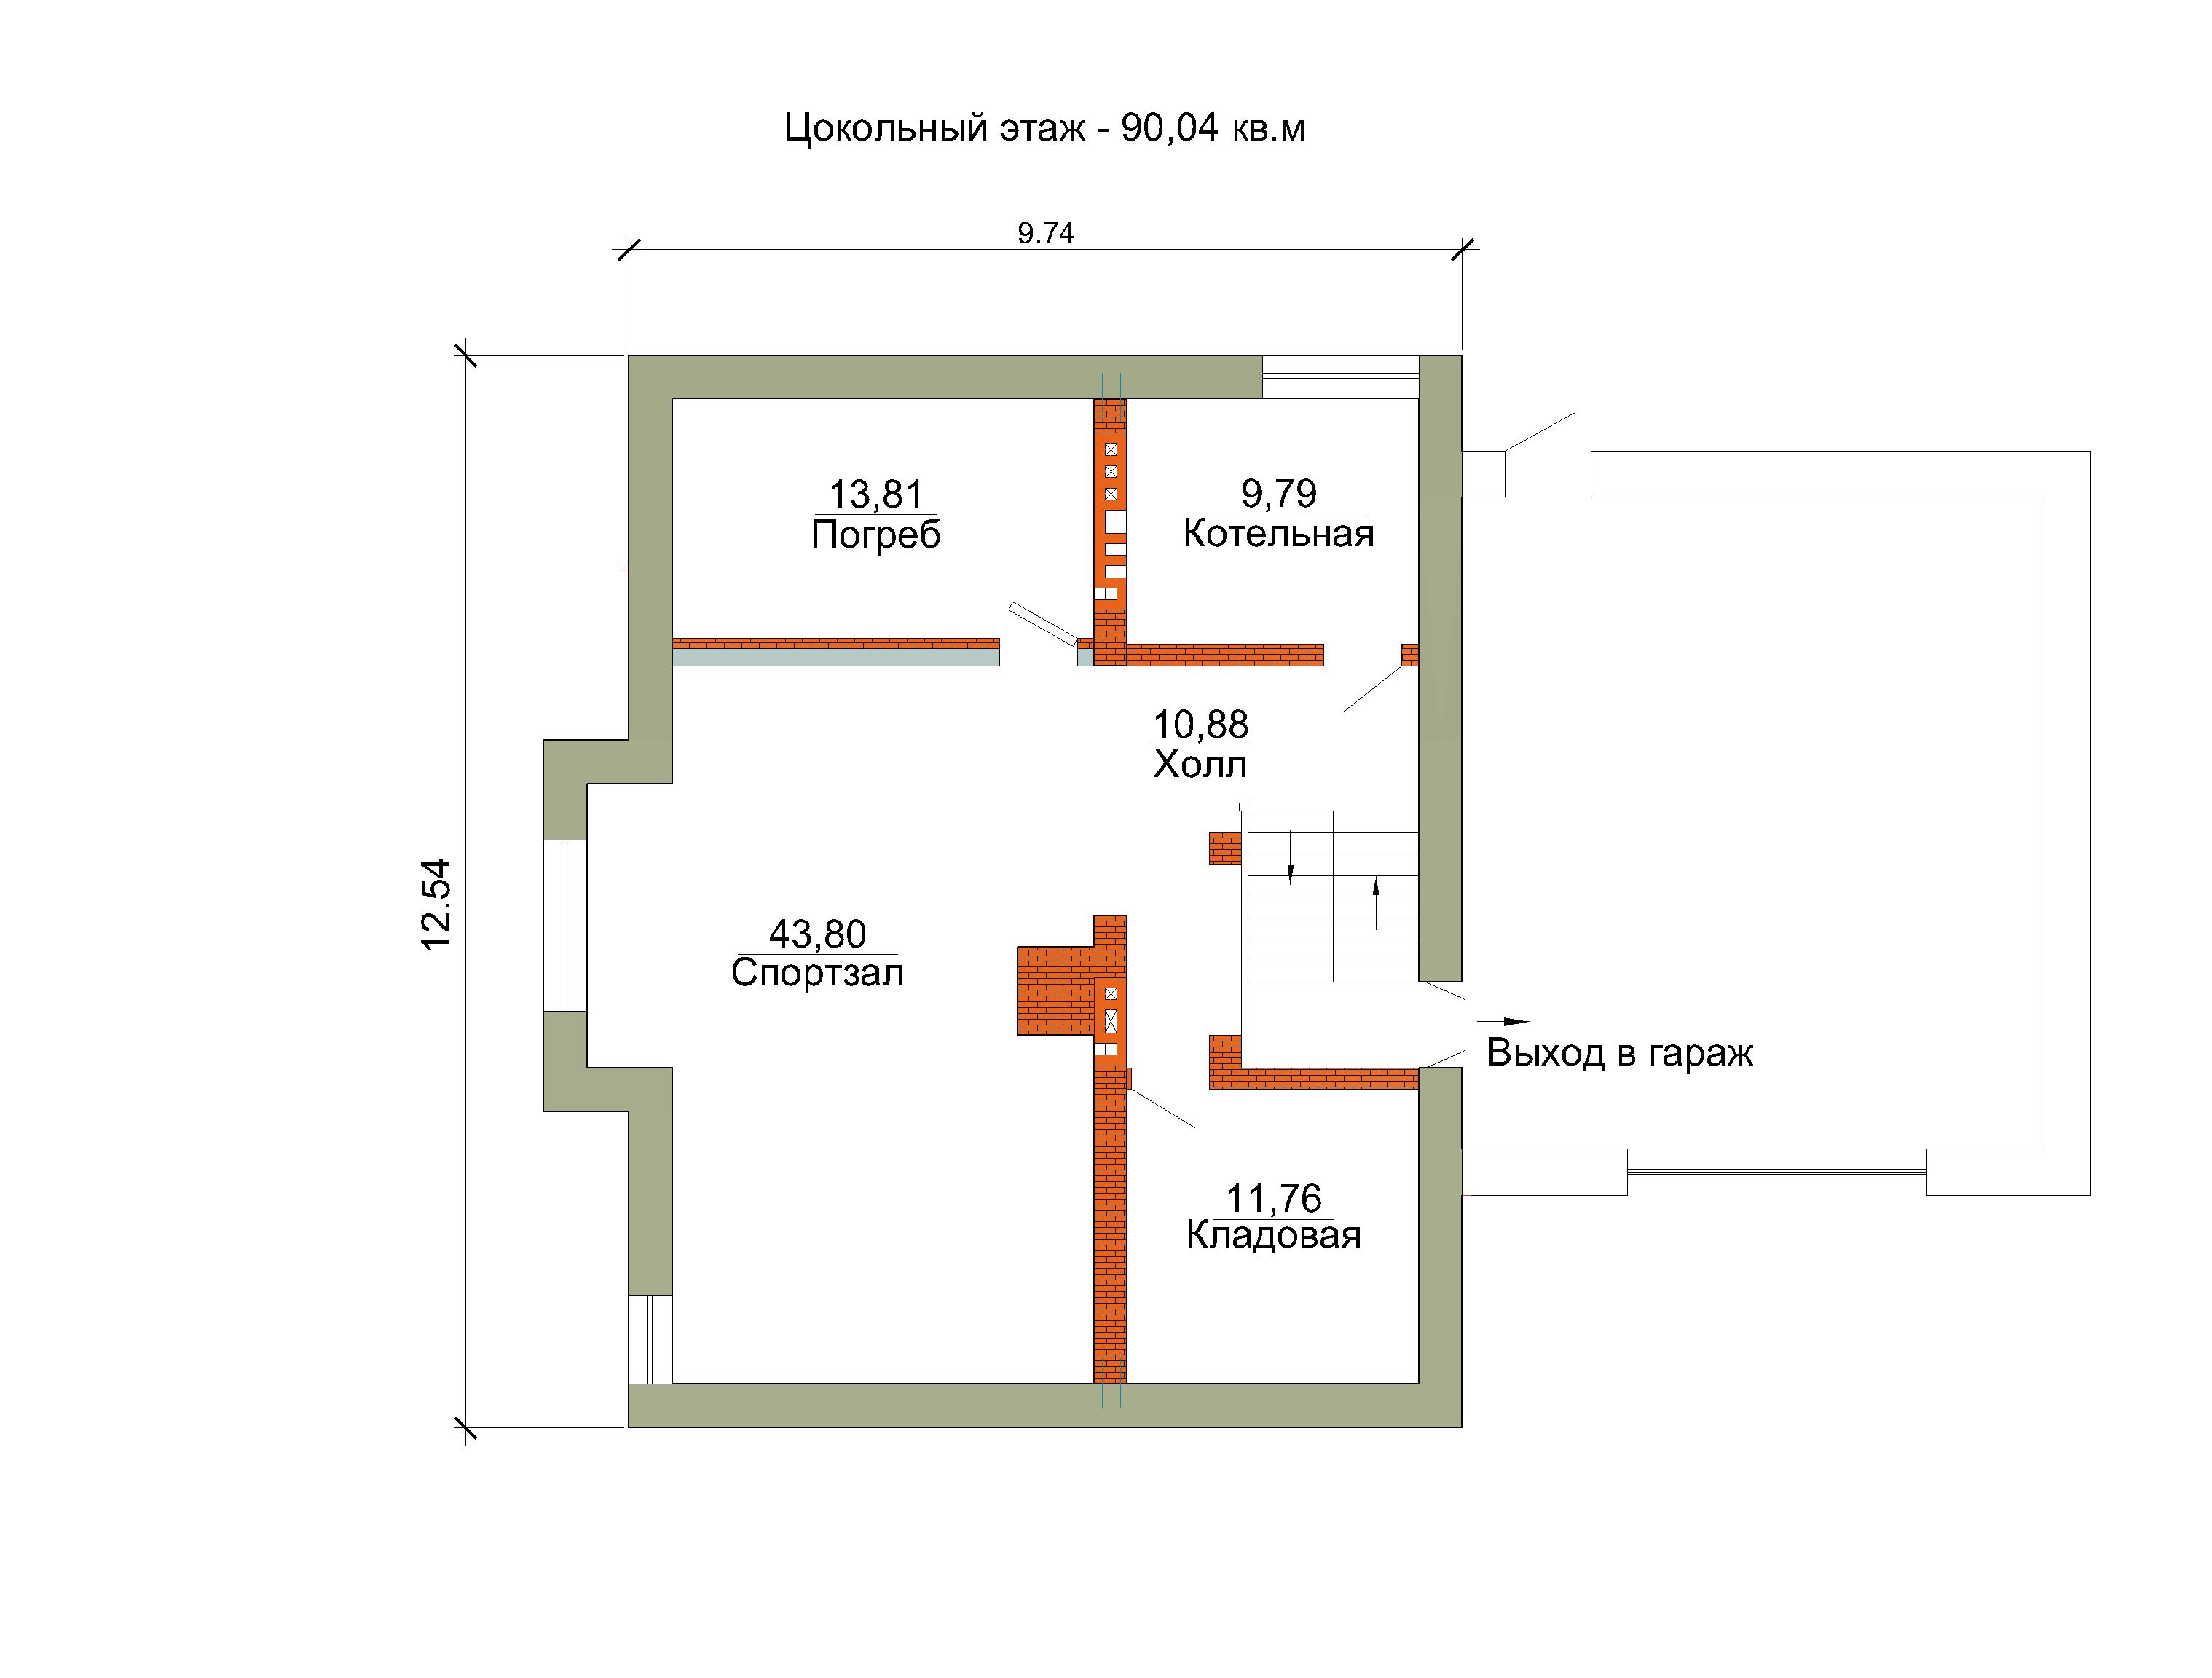 Готовый проект коттеджа 343 м2 / Артикул ОИ-125 план